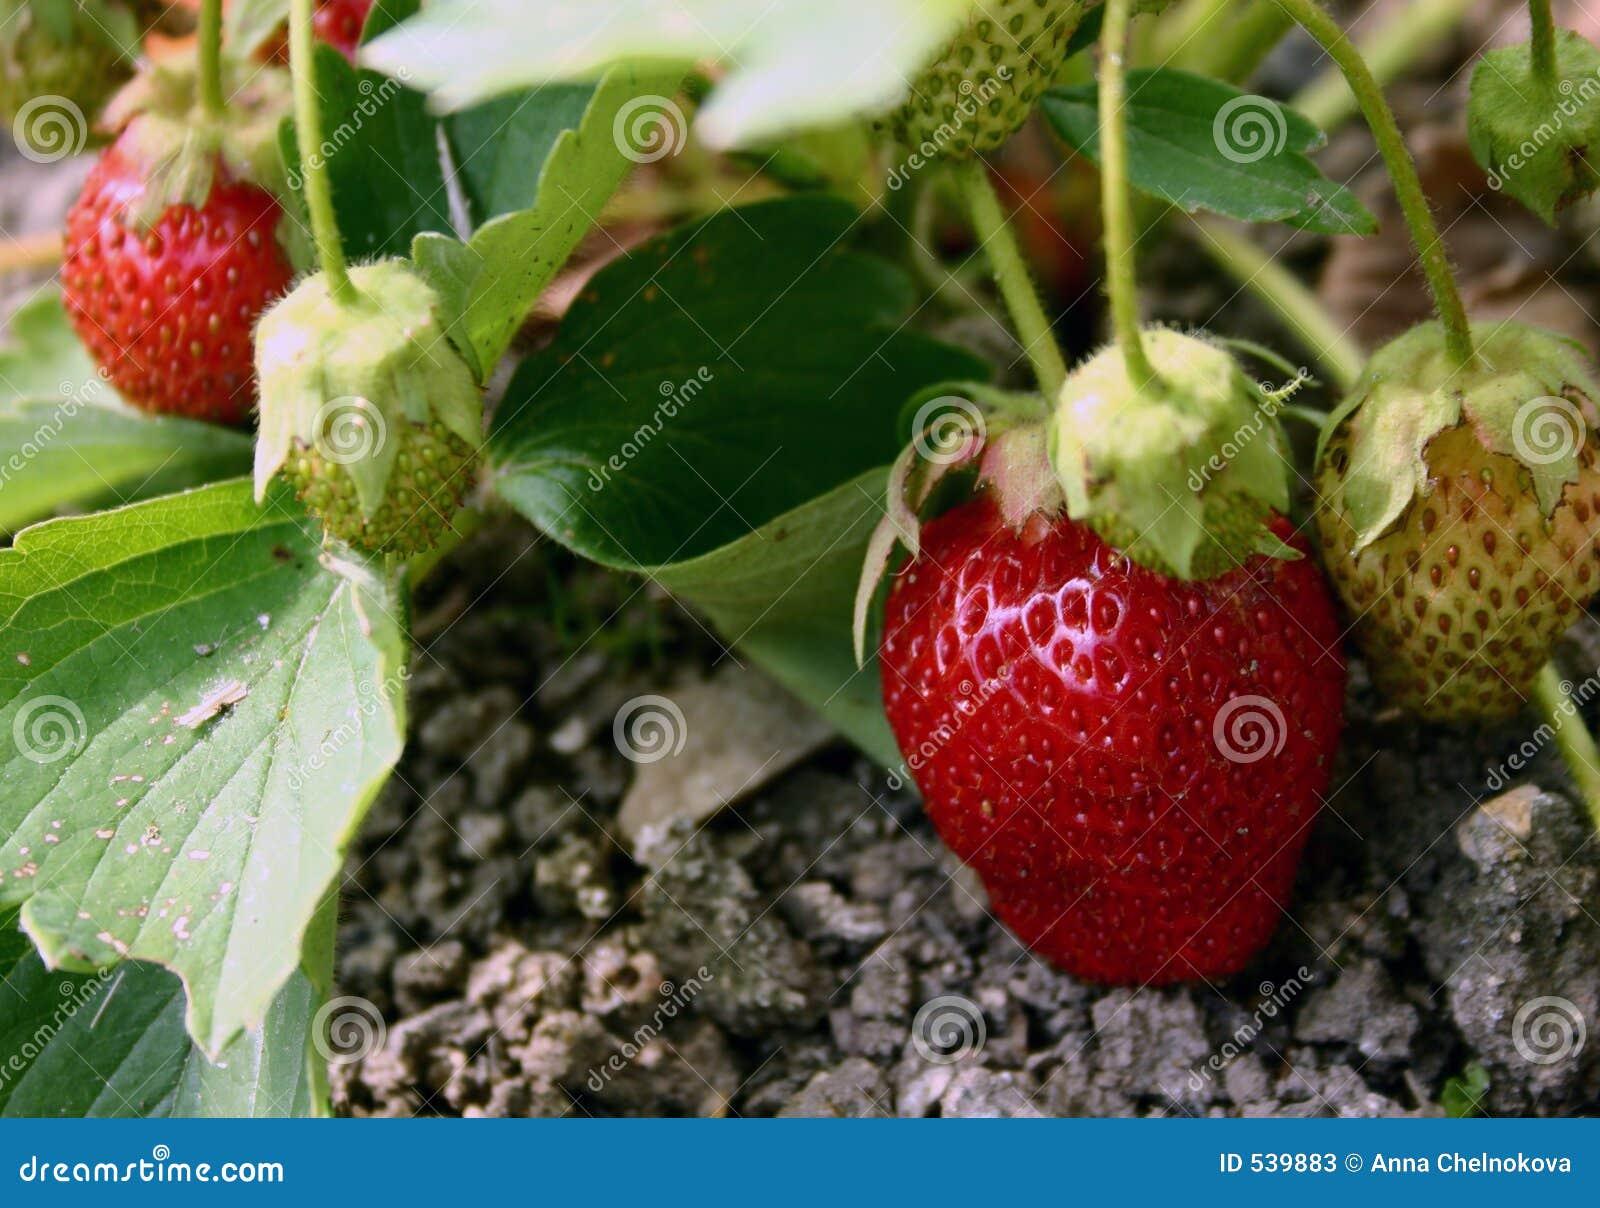 Download 草莓 库存图片. 图片 包括有 庄稼, 生态, 本质, 工厂, 季节, 农夫, 草莓, 土壤, 庭院, 叶子 - 539883